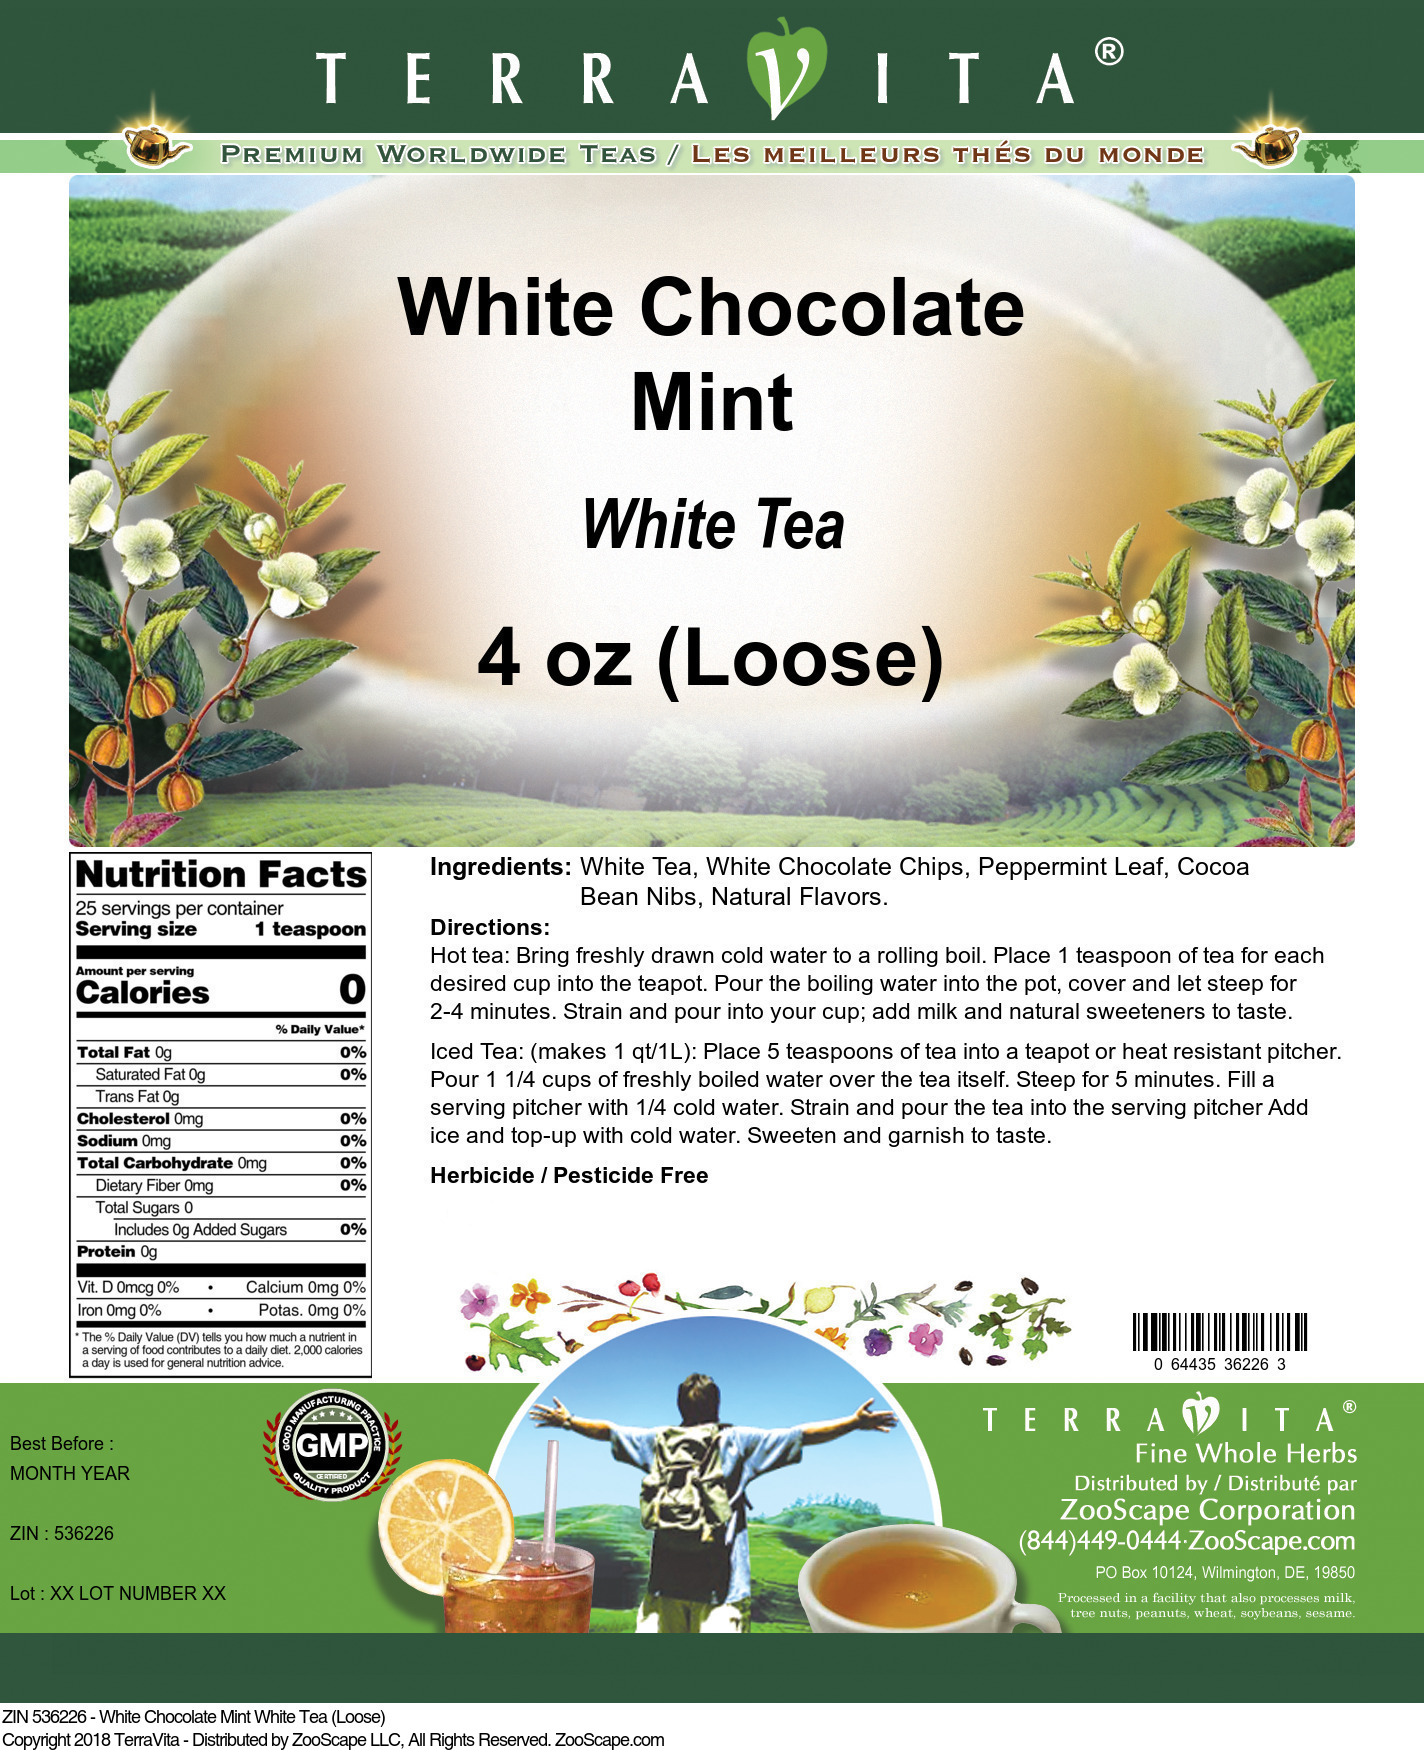 White Chocolate Mint White Tea (Loose)